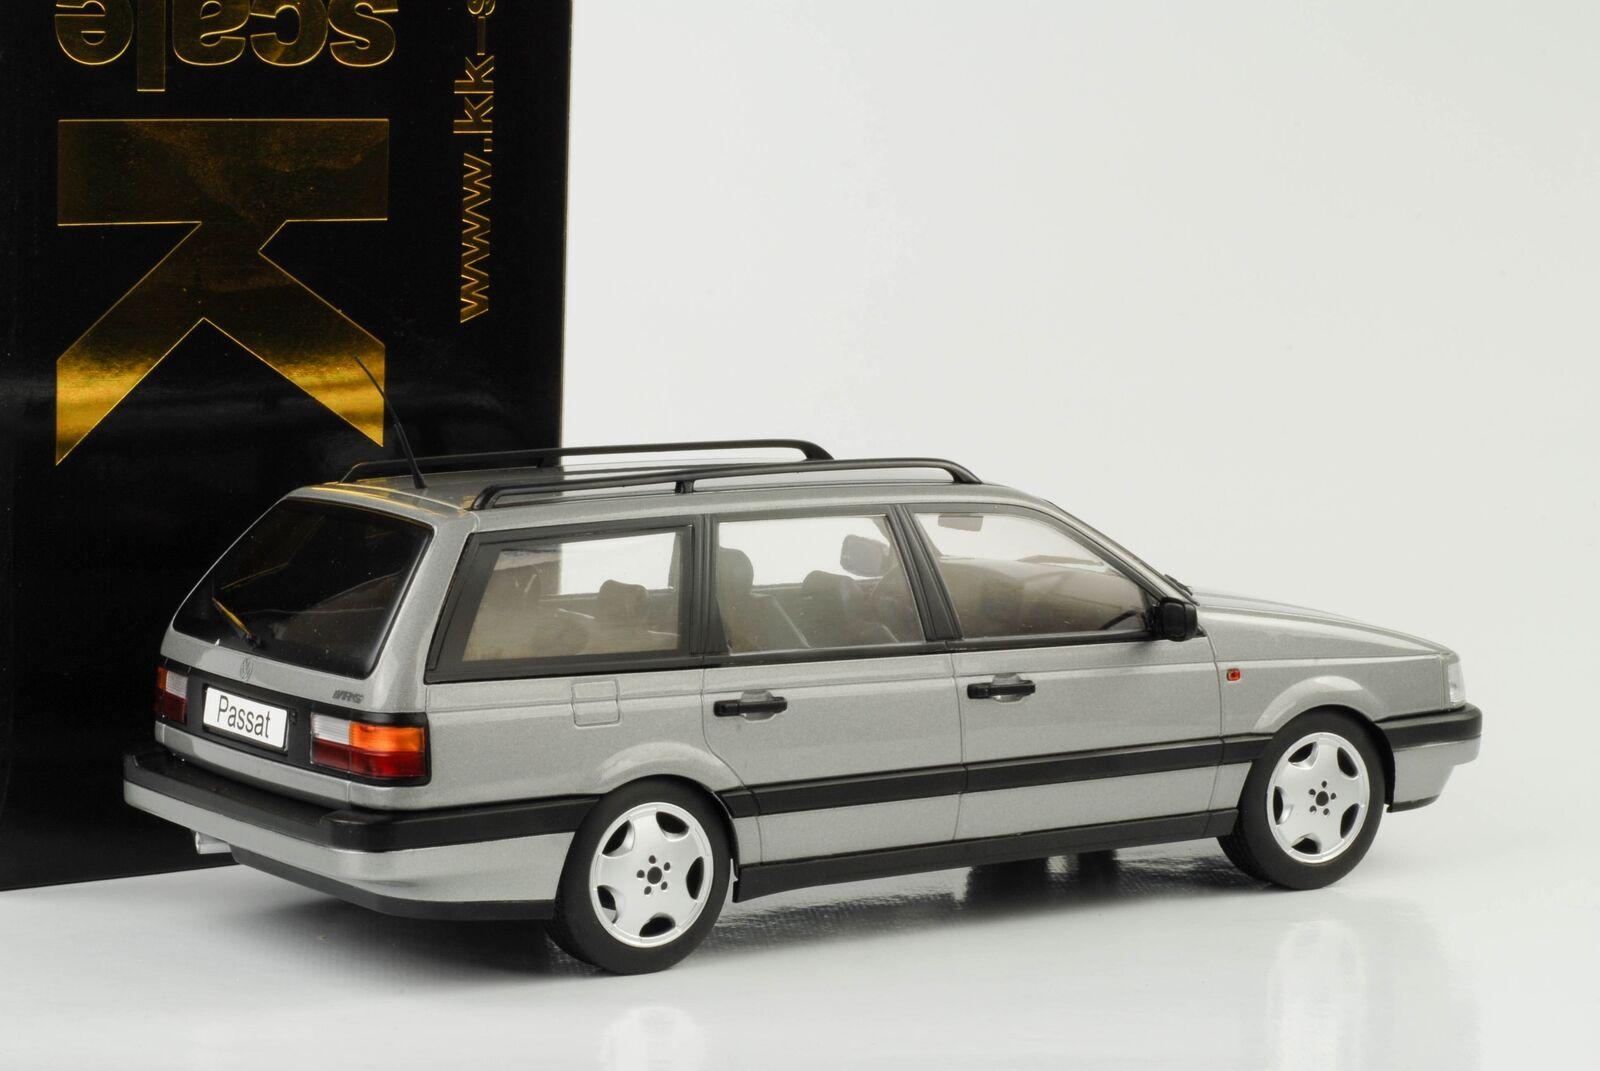 1988 Volkswagen VW Passat B3 Vr6 Variant grigio Metálico 1 18 Kk